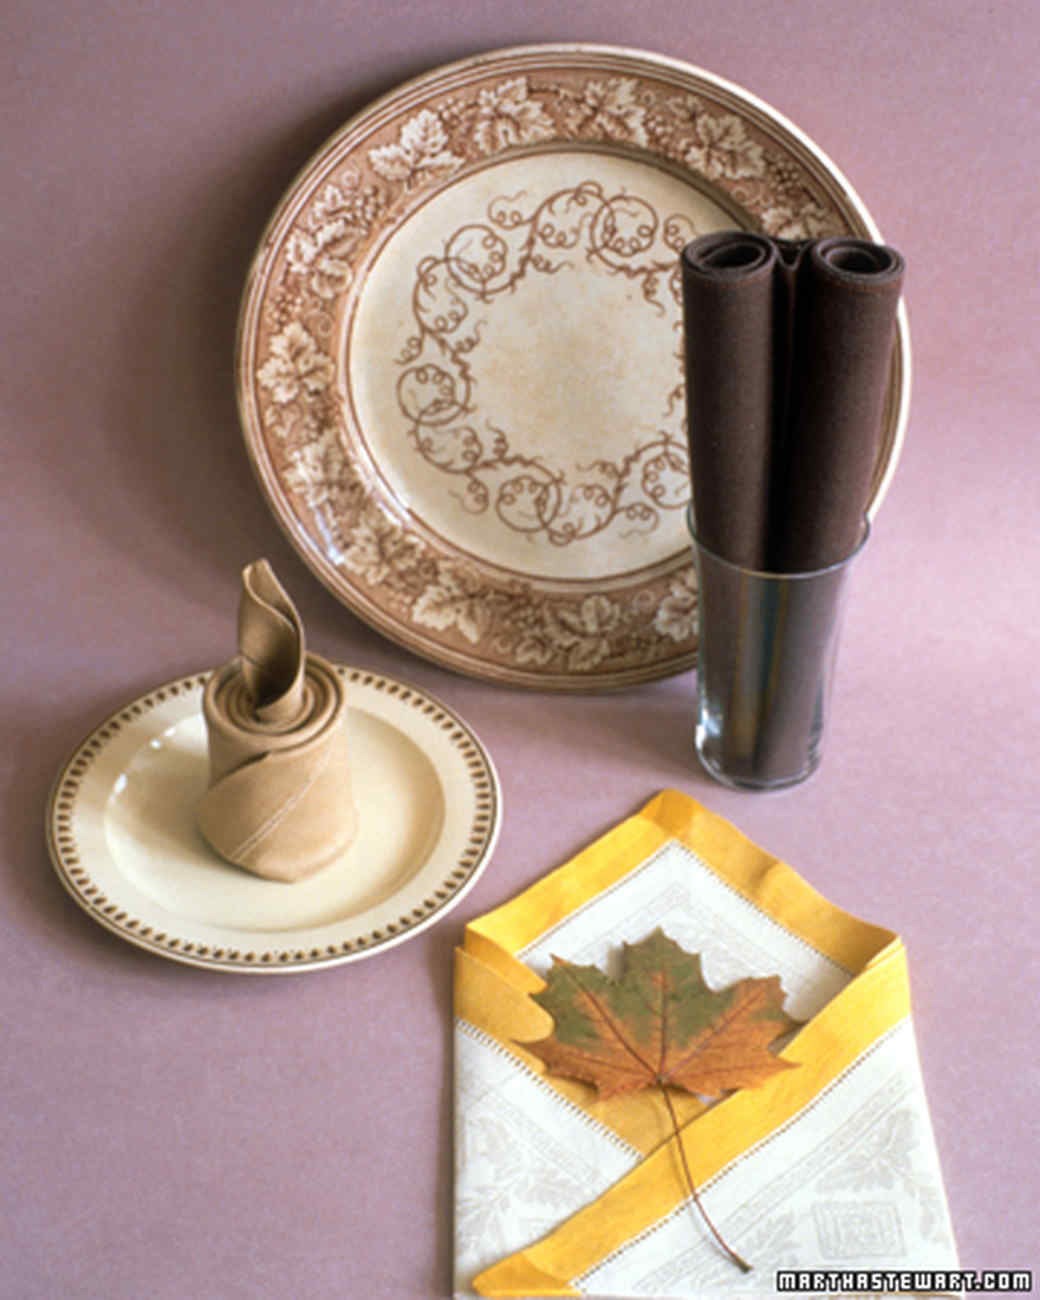 & Napkin-Folding Ideas | Martha Stewart